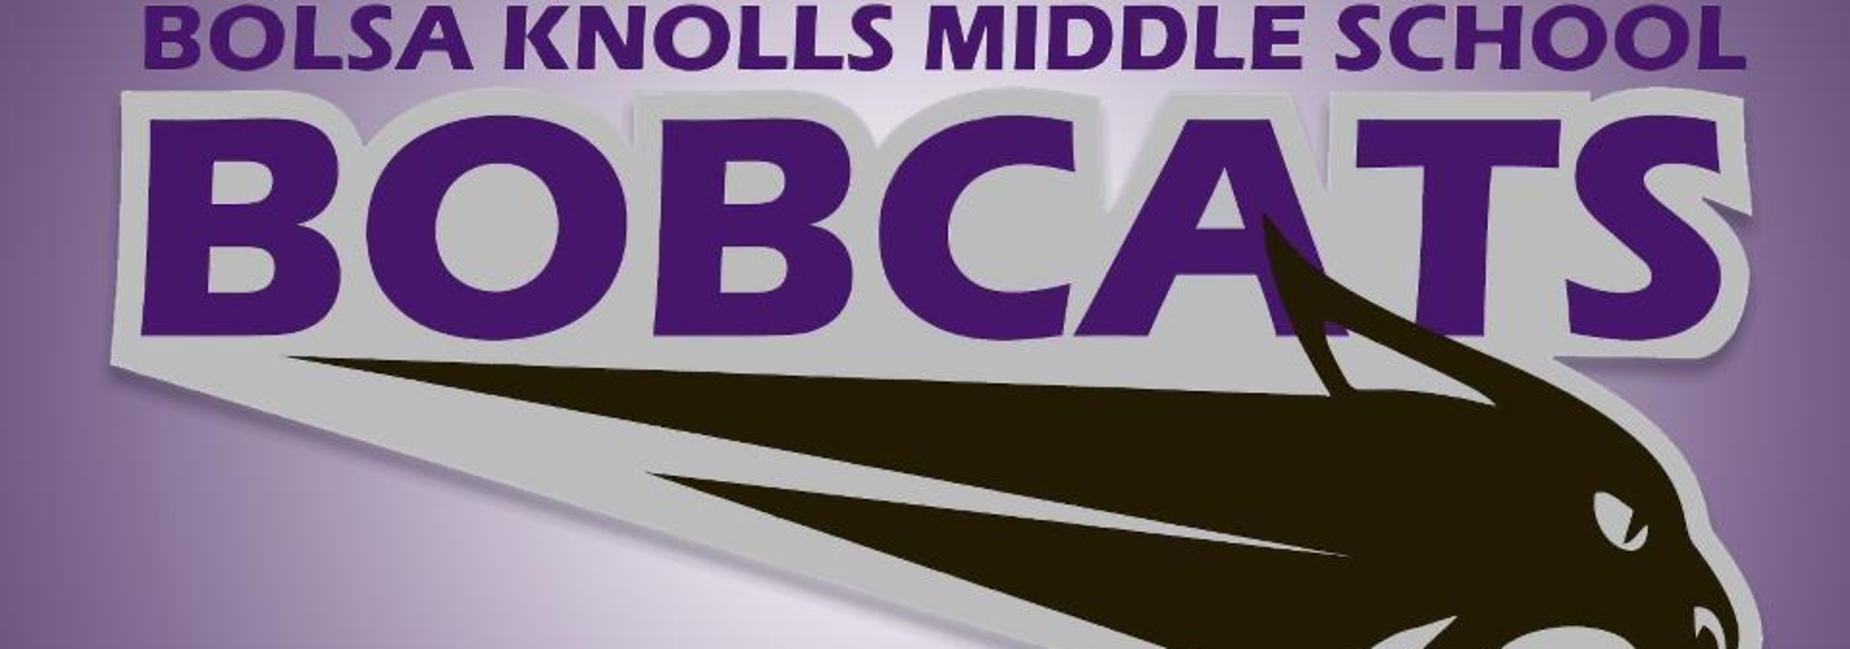 Bolsa Knolls Middle School